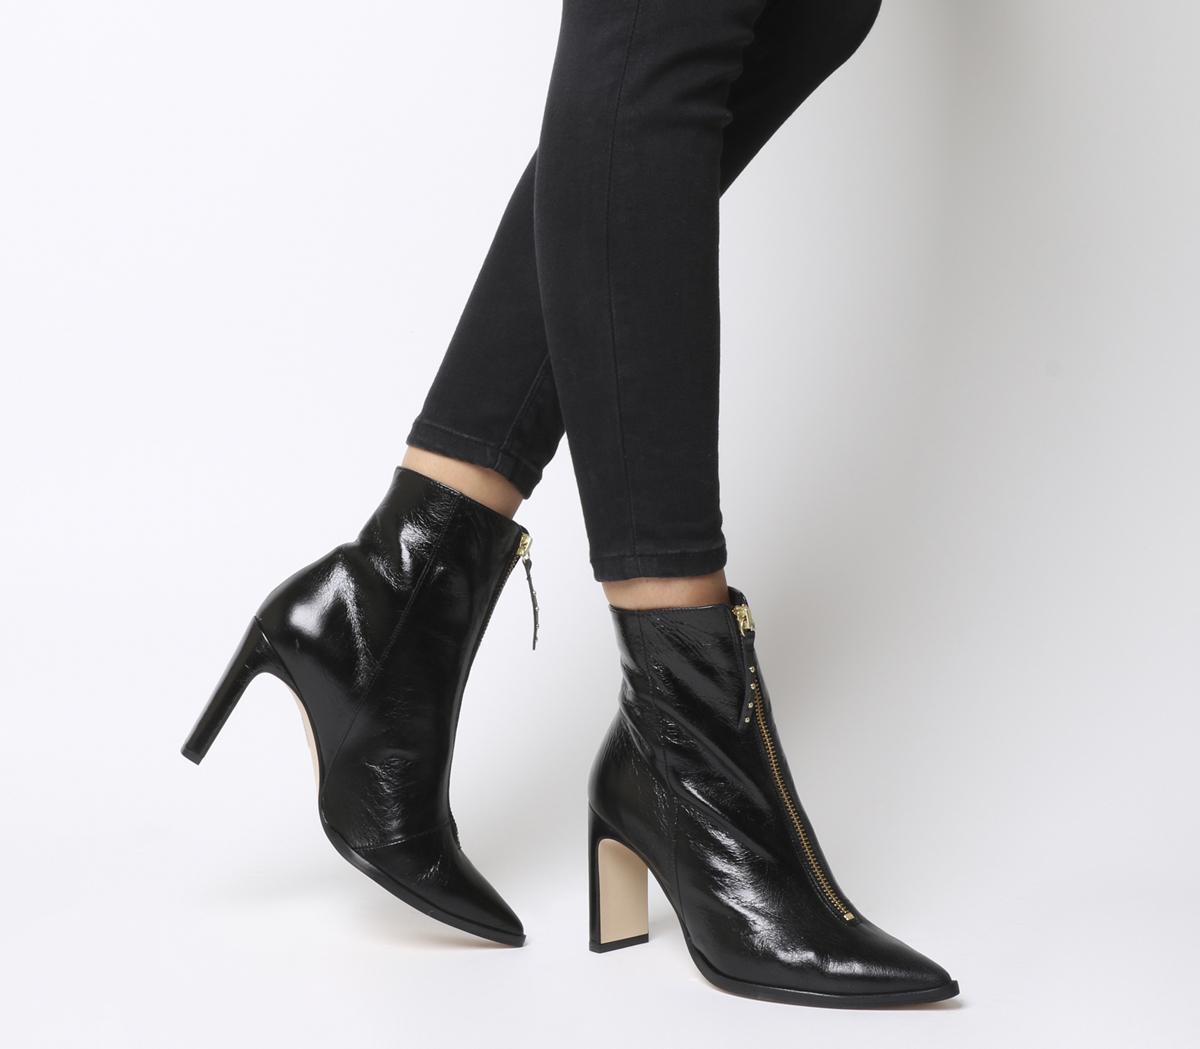 Avenge Front Zip Heeled Boots